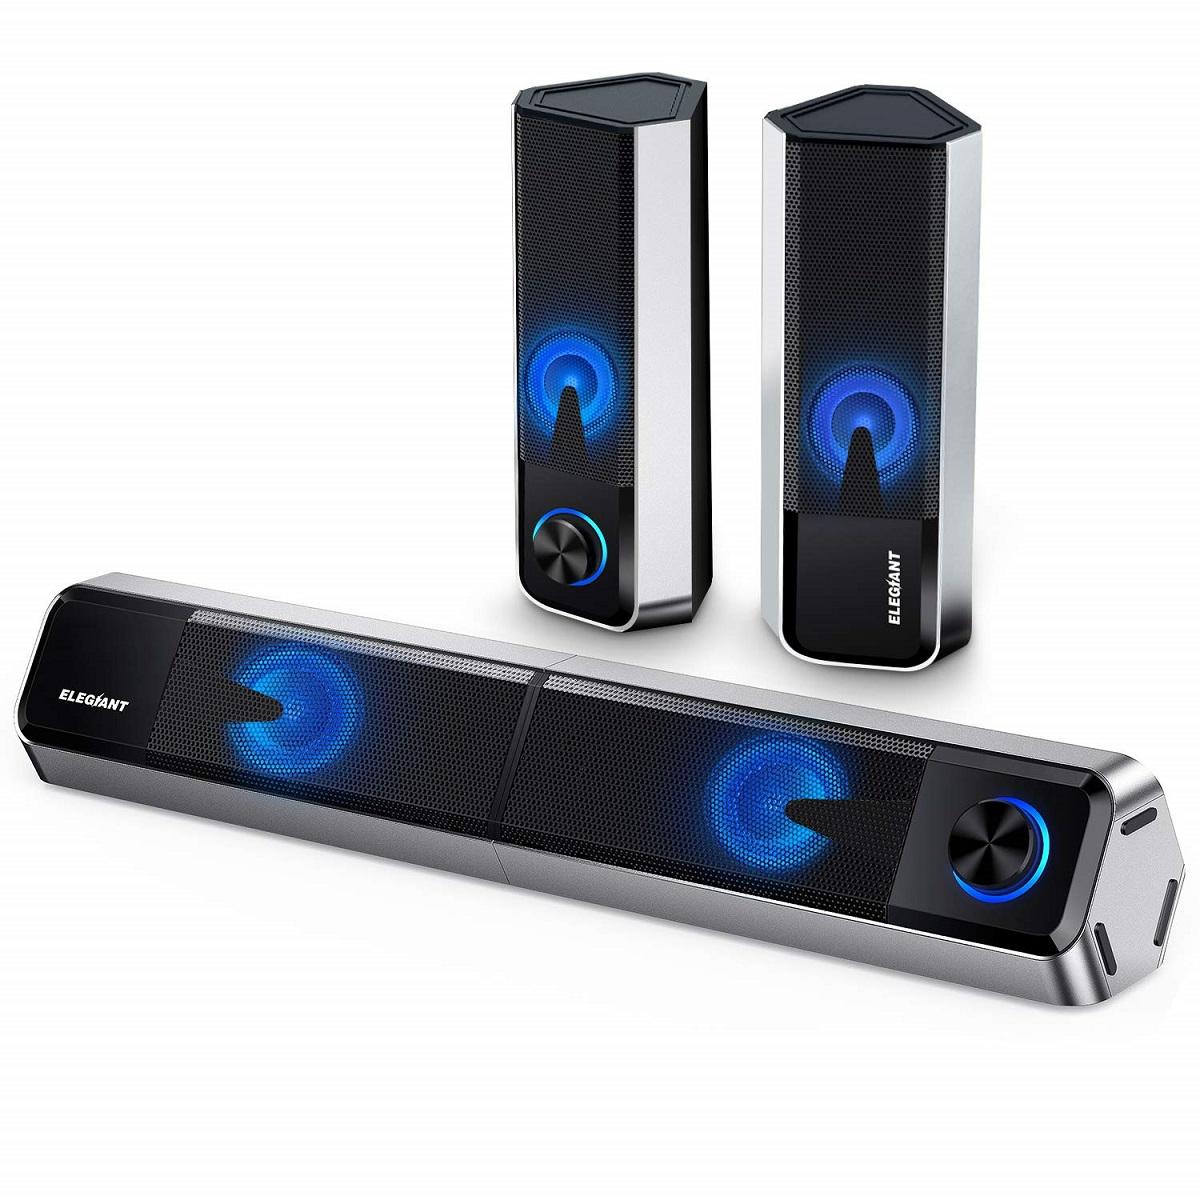 ELEGIANT PC Lautsprecher (Soundbar) 10 W Bluetooth 5.0 & AUX Play